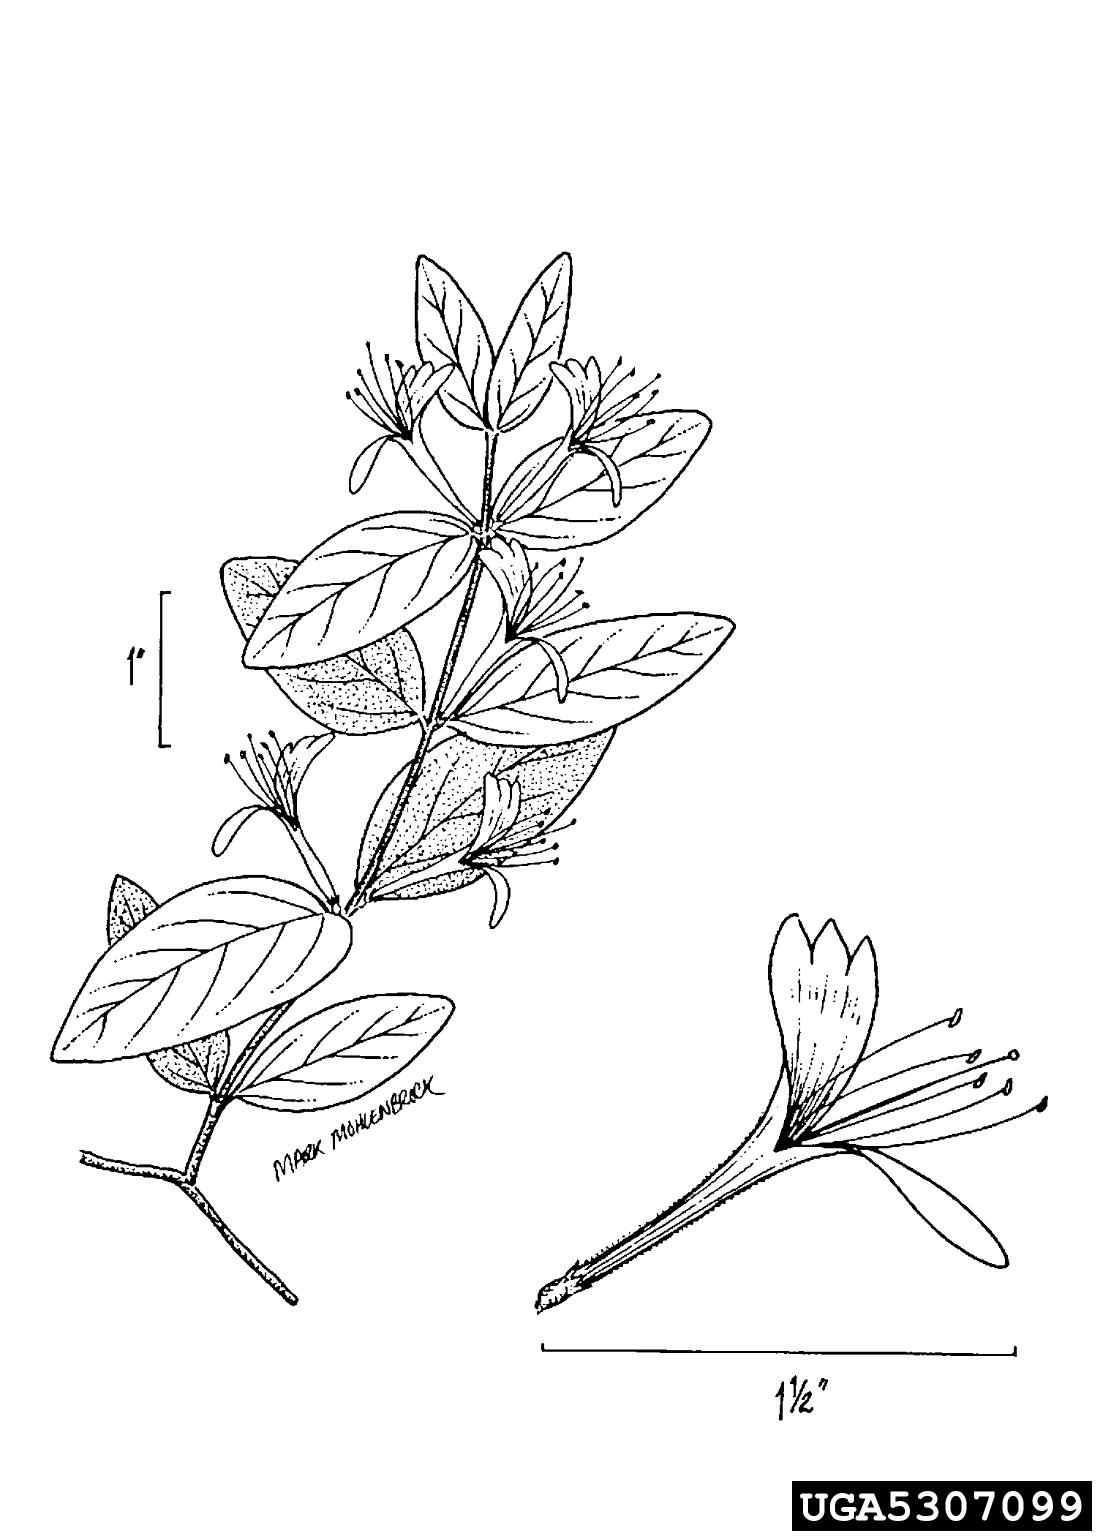 Japanese Honeysuckle Lonicera Japonica Dipsacales